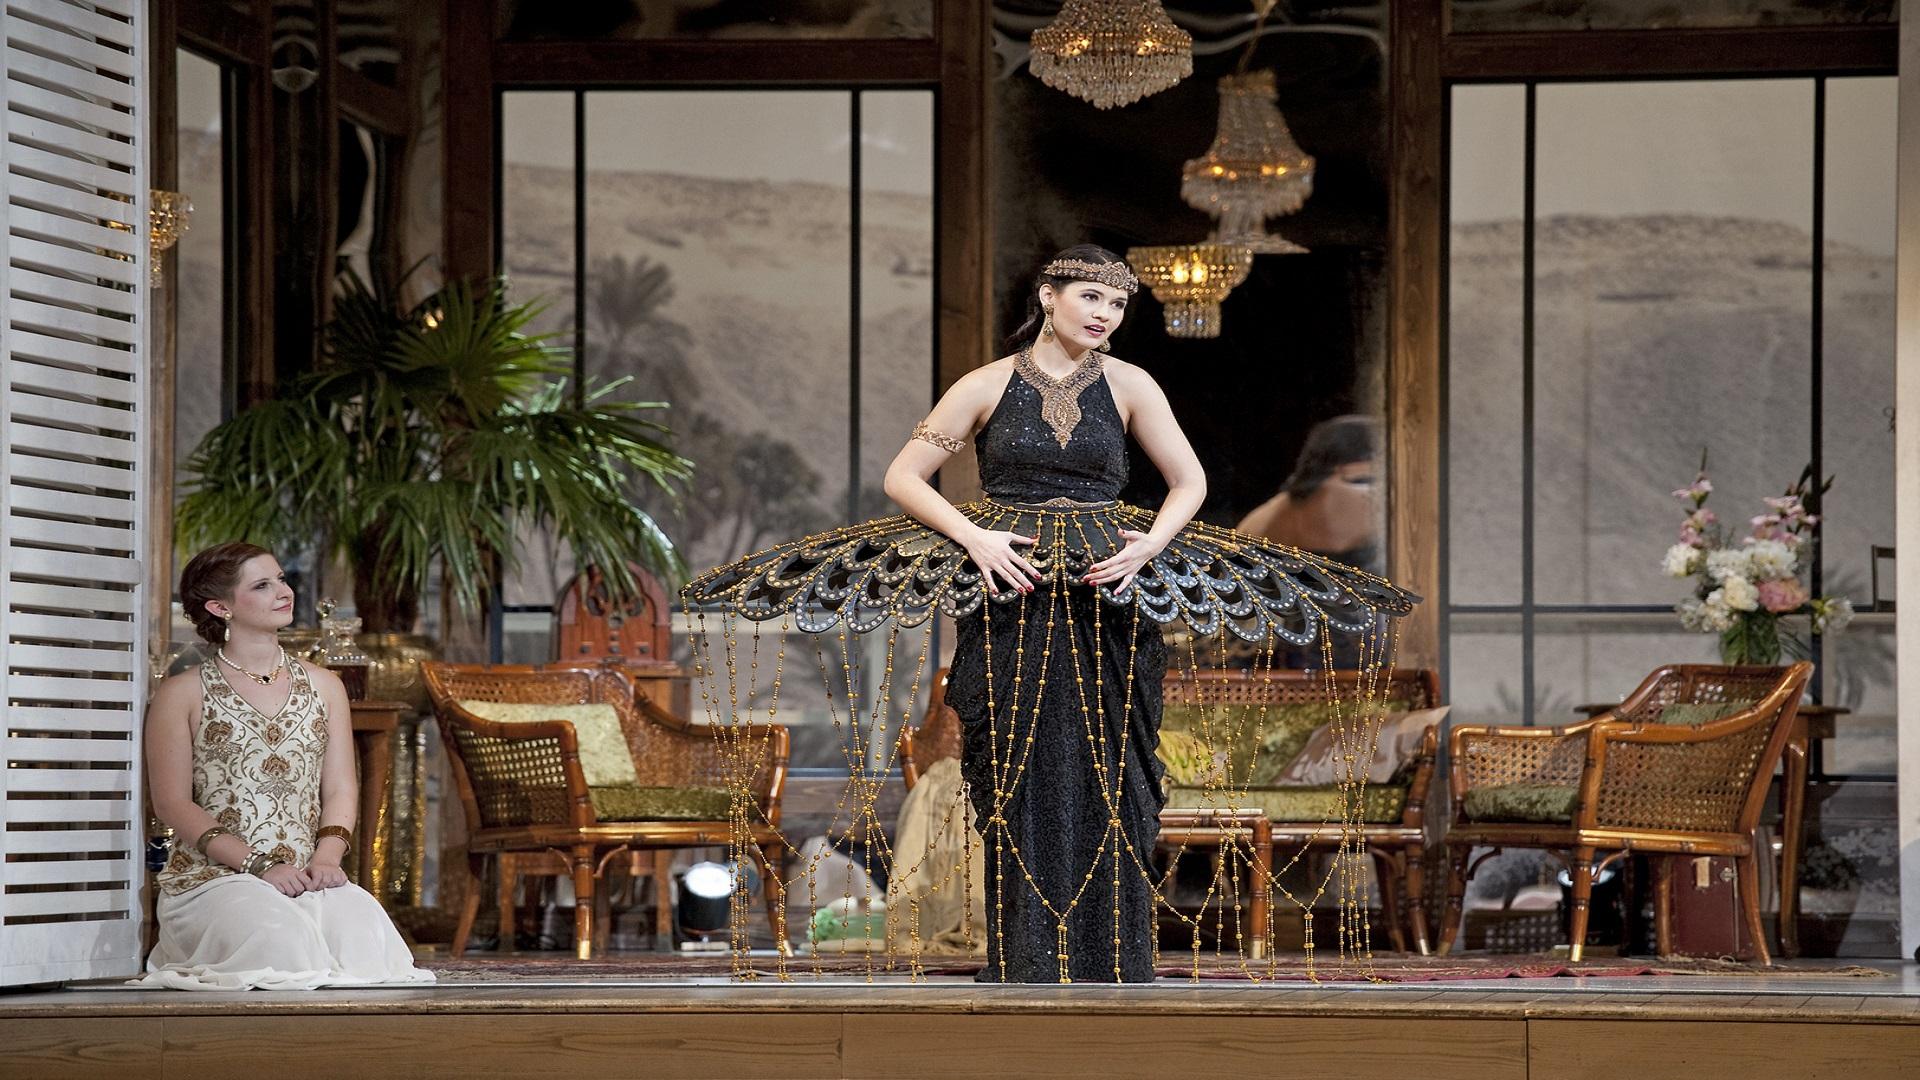 Pilger-Von-Mekka-Opera-Stage-Director-Jacopo-Spirei-6